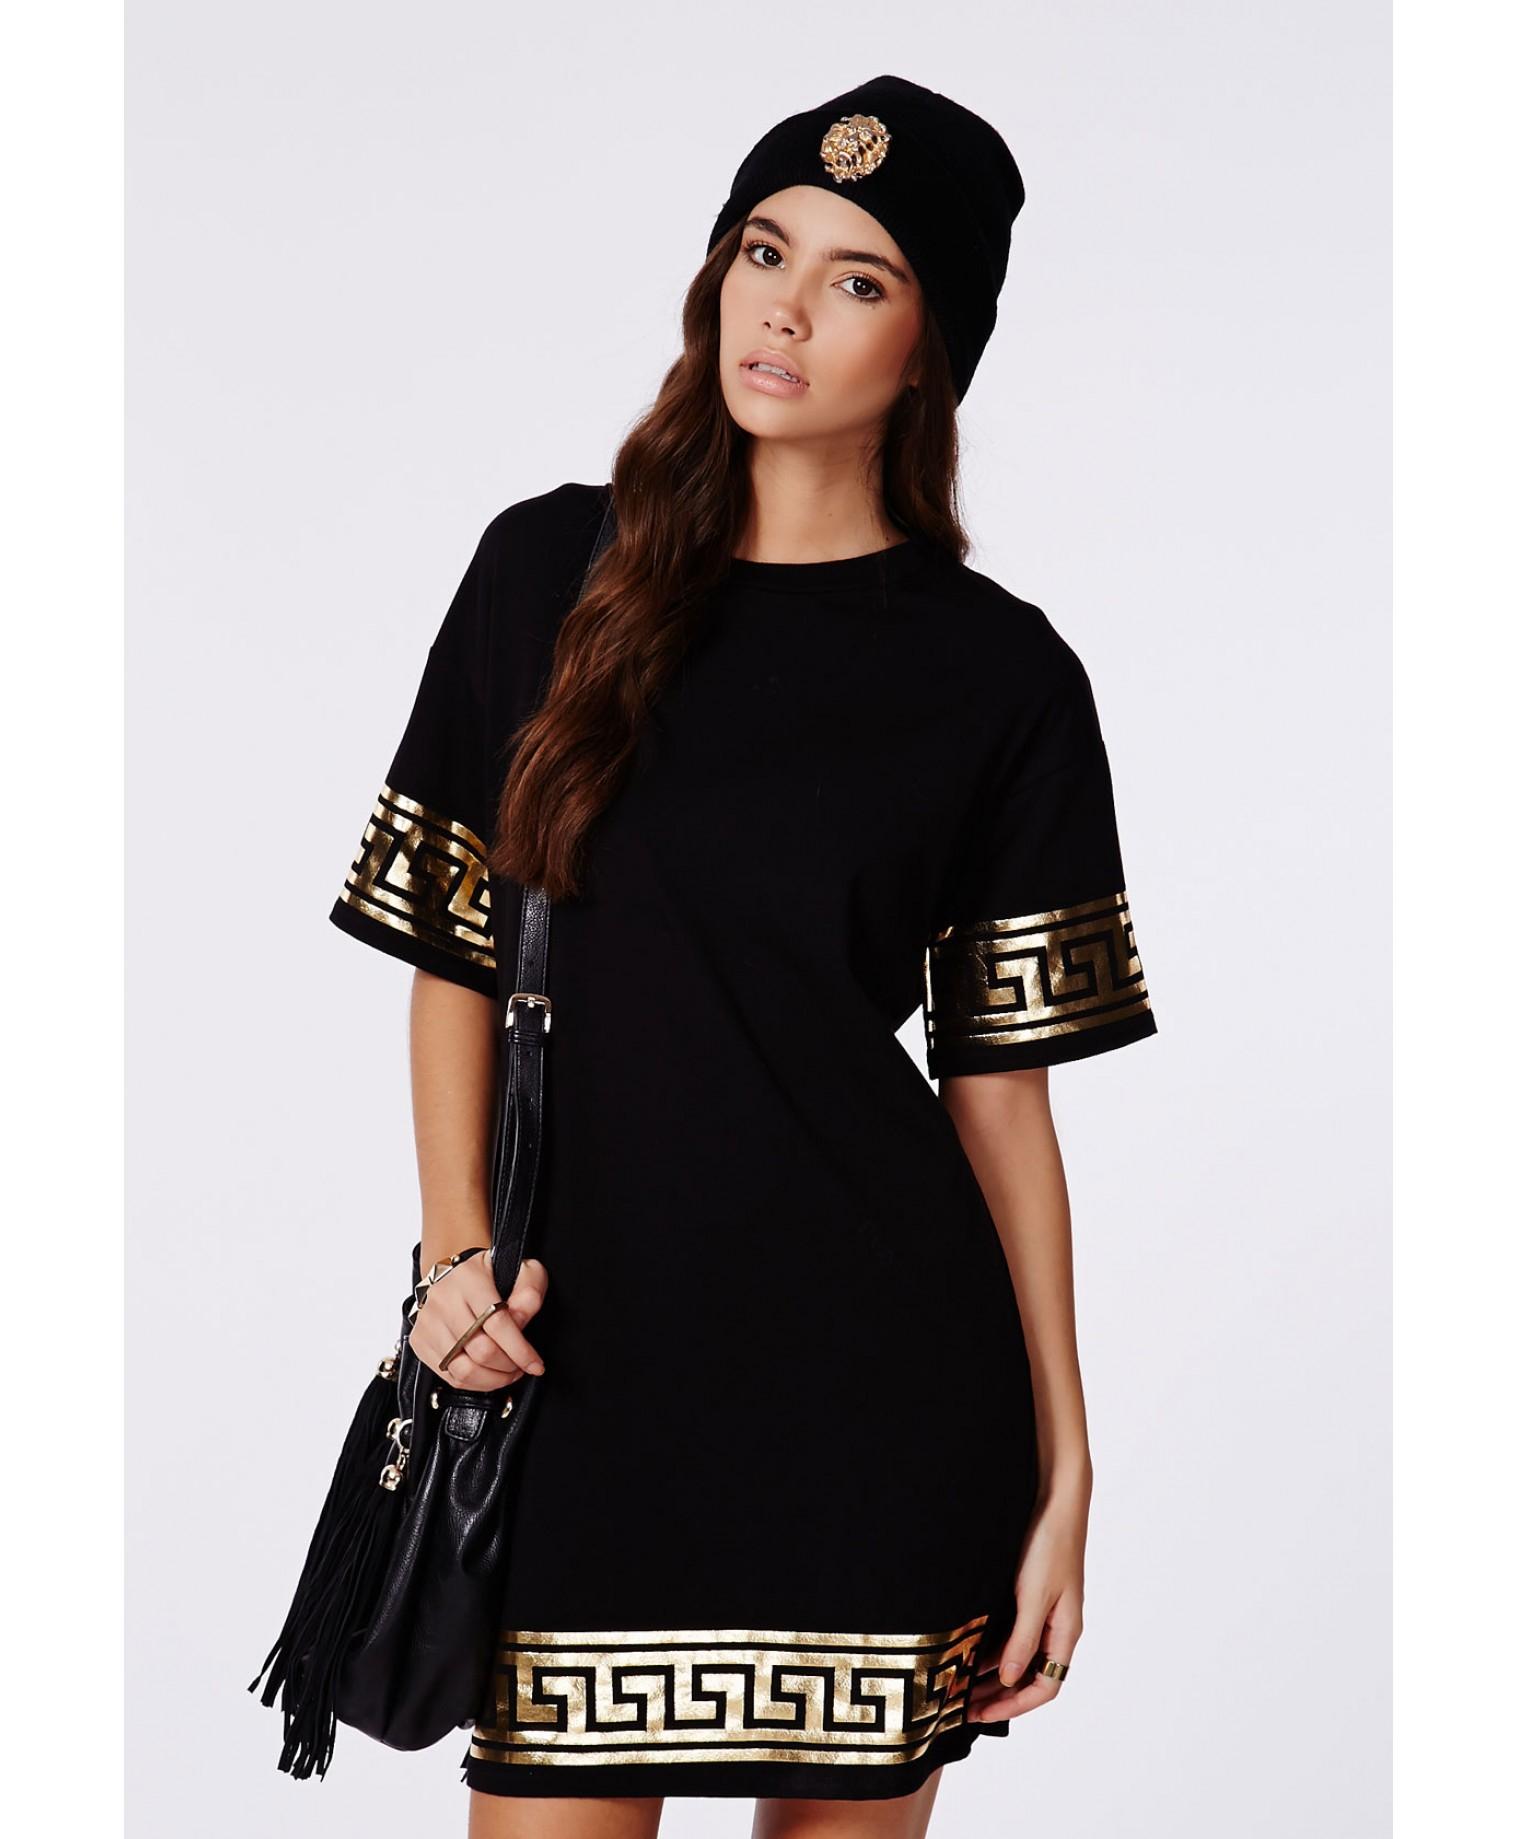 20b09142868a Black And Gold T Shirt Dress - DREAMWORKS